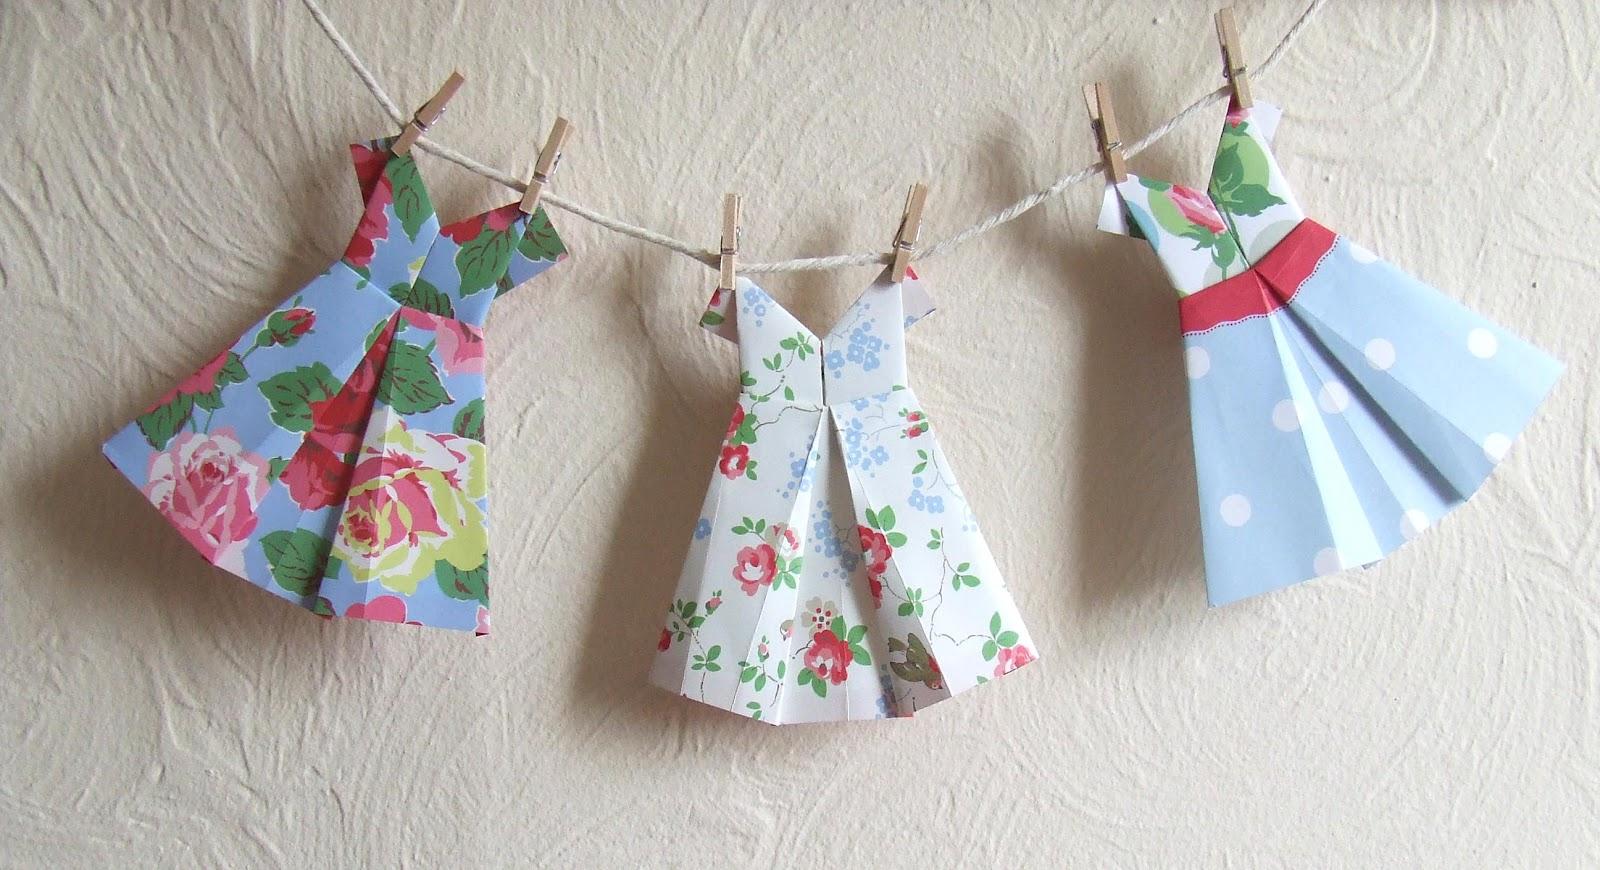 feltmeup designs origami dresses